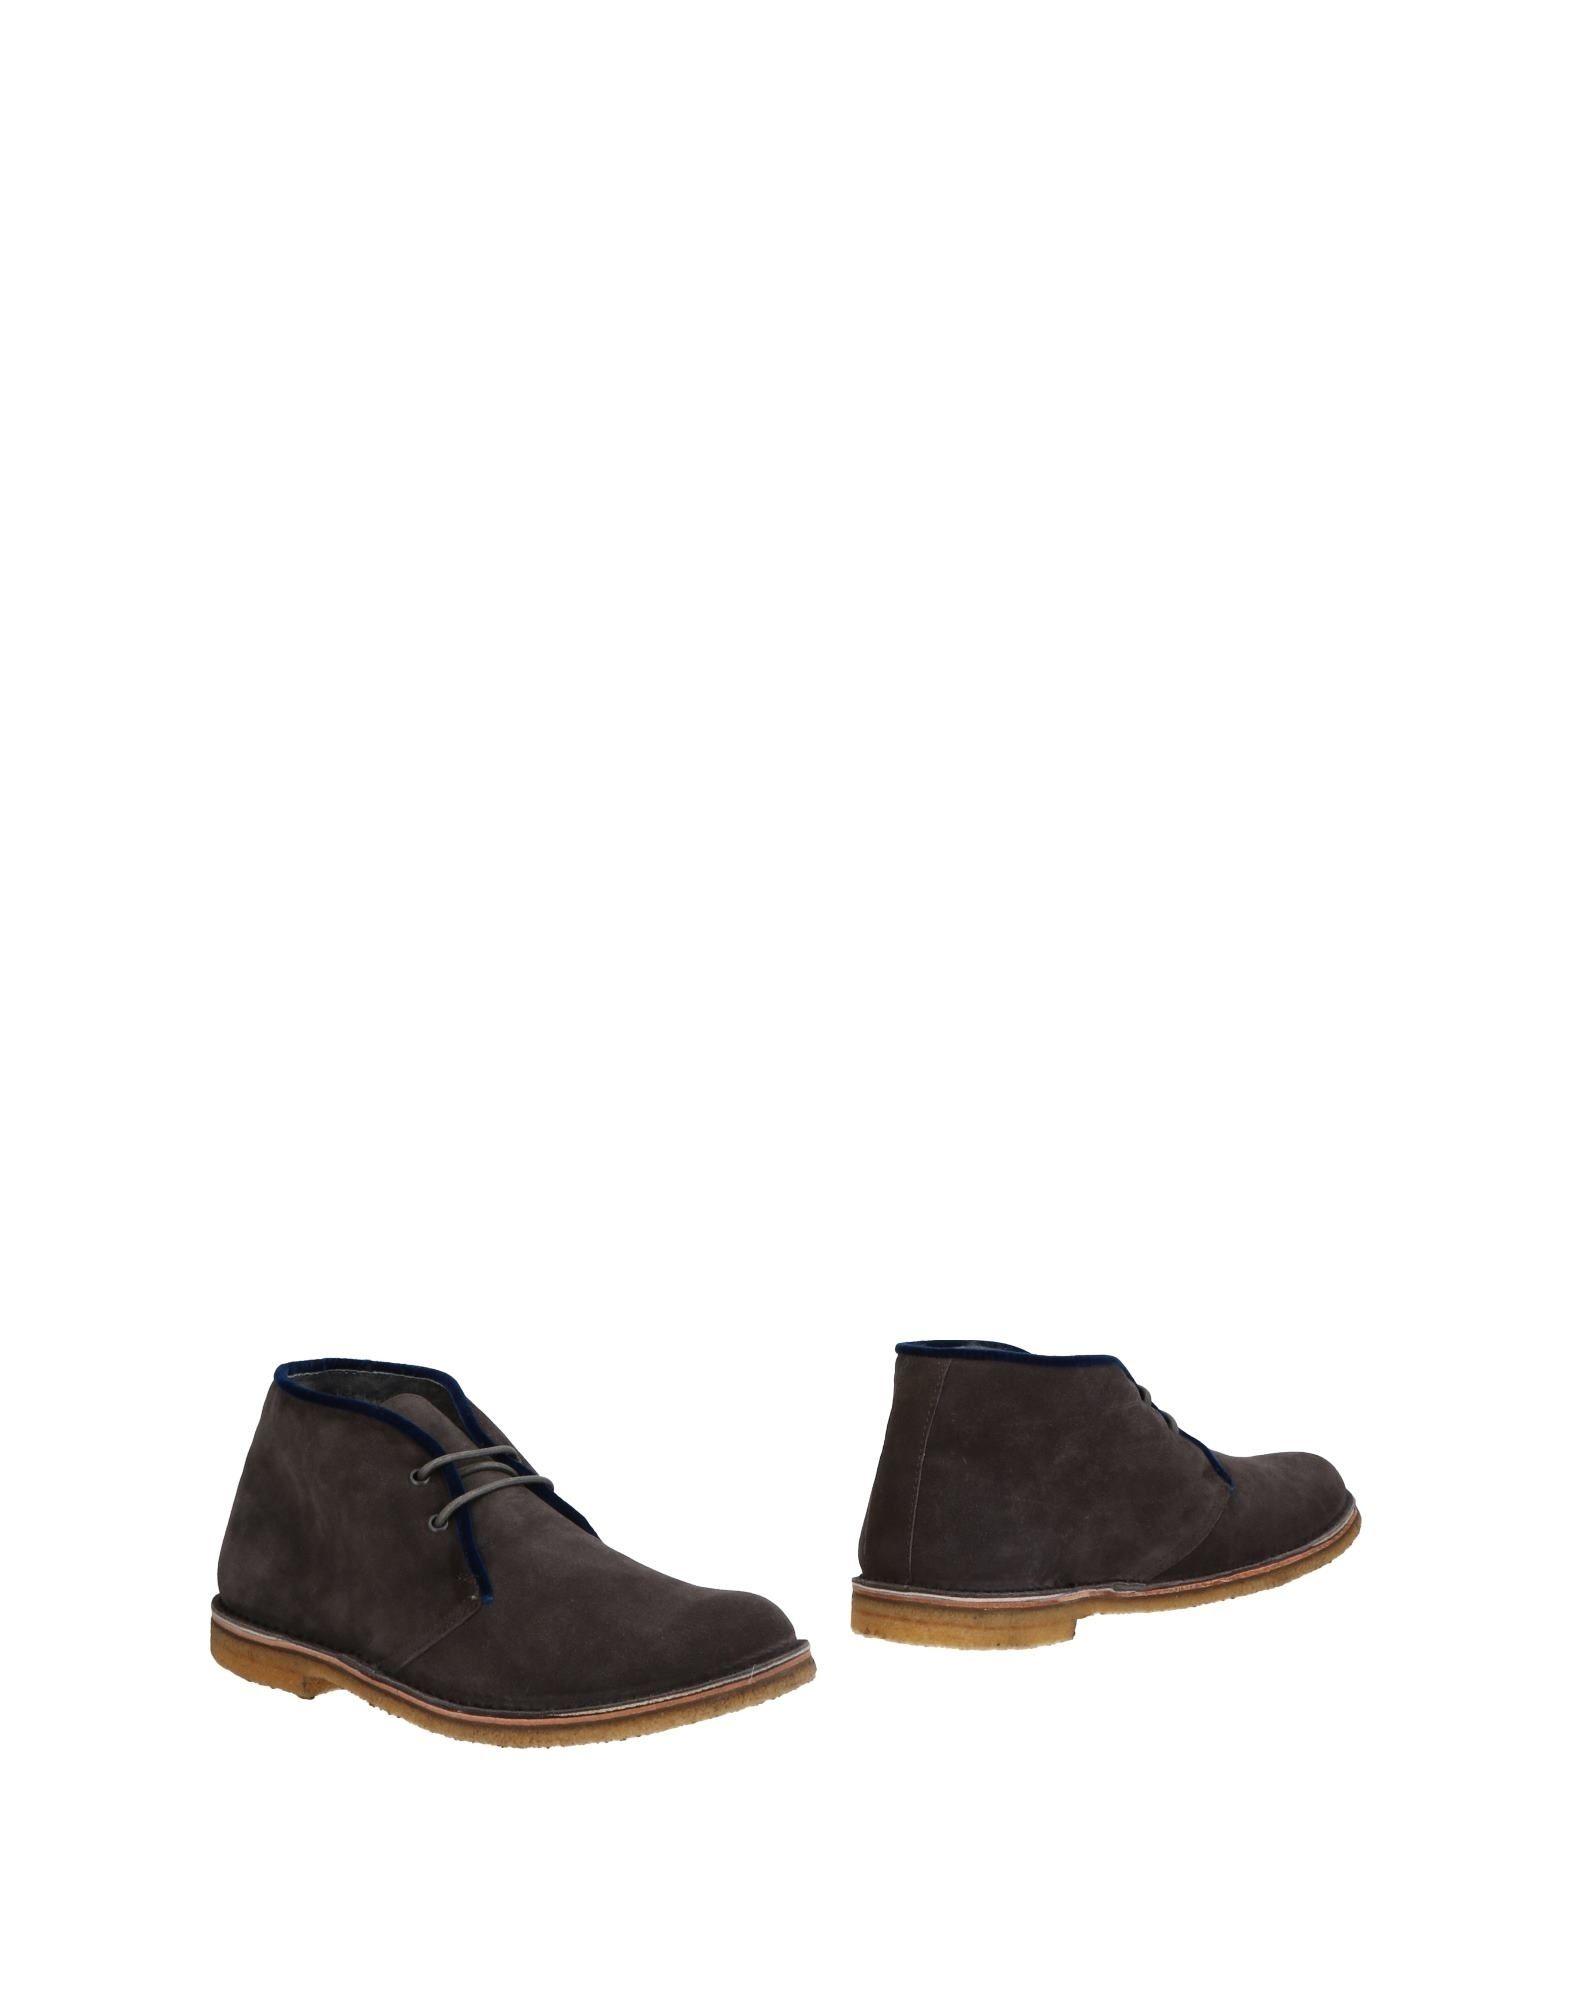 Alberto 11498310DB Moretti Stiefelette Herren  11498310DB Alberto Gute Qualität beliebte Schuhe eb1f7a